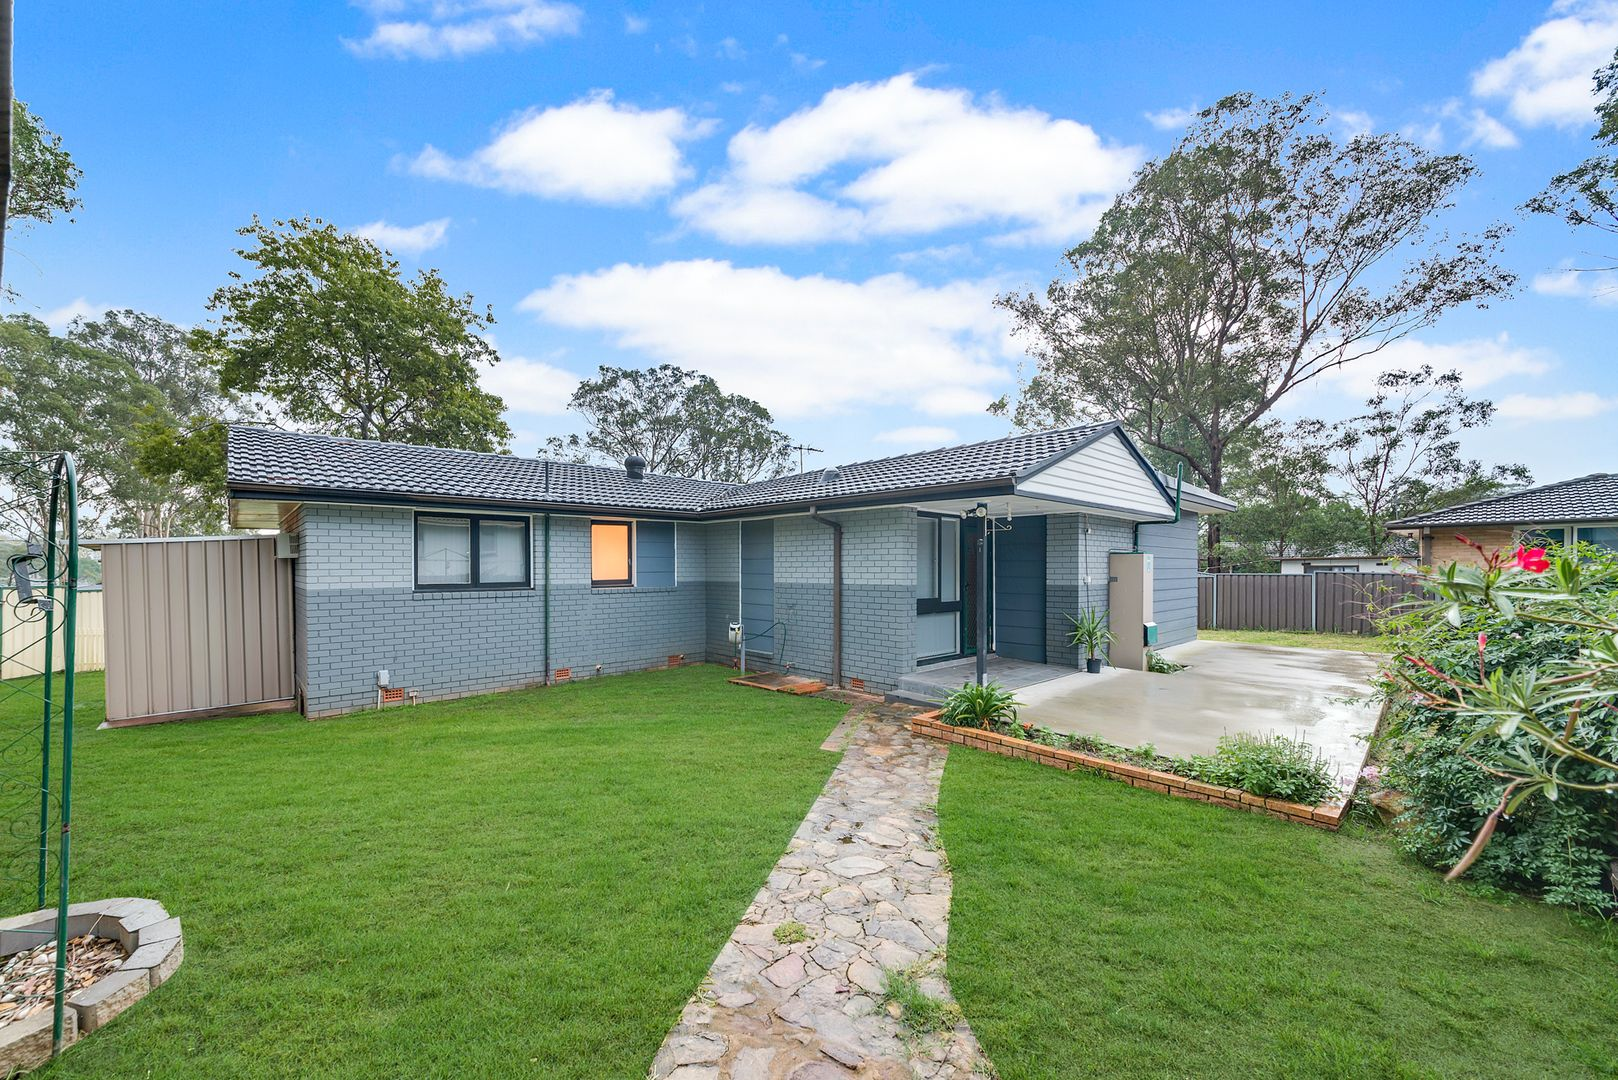 Macquarie Fields NSW 2564, Image 0